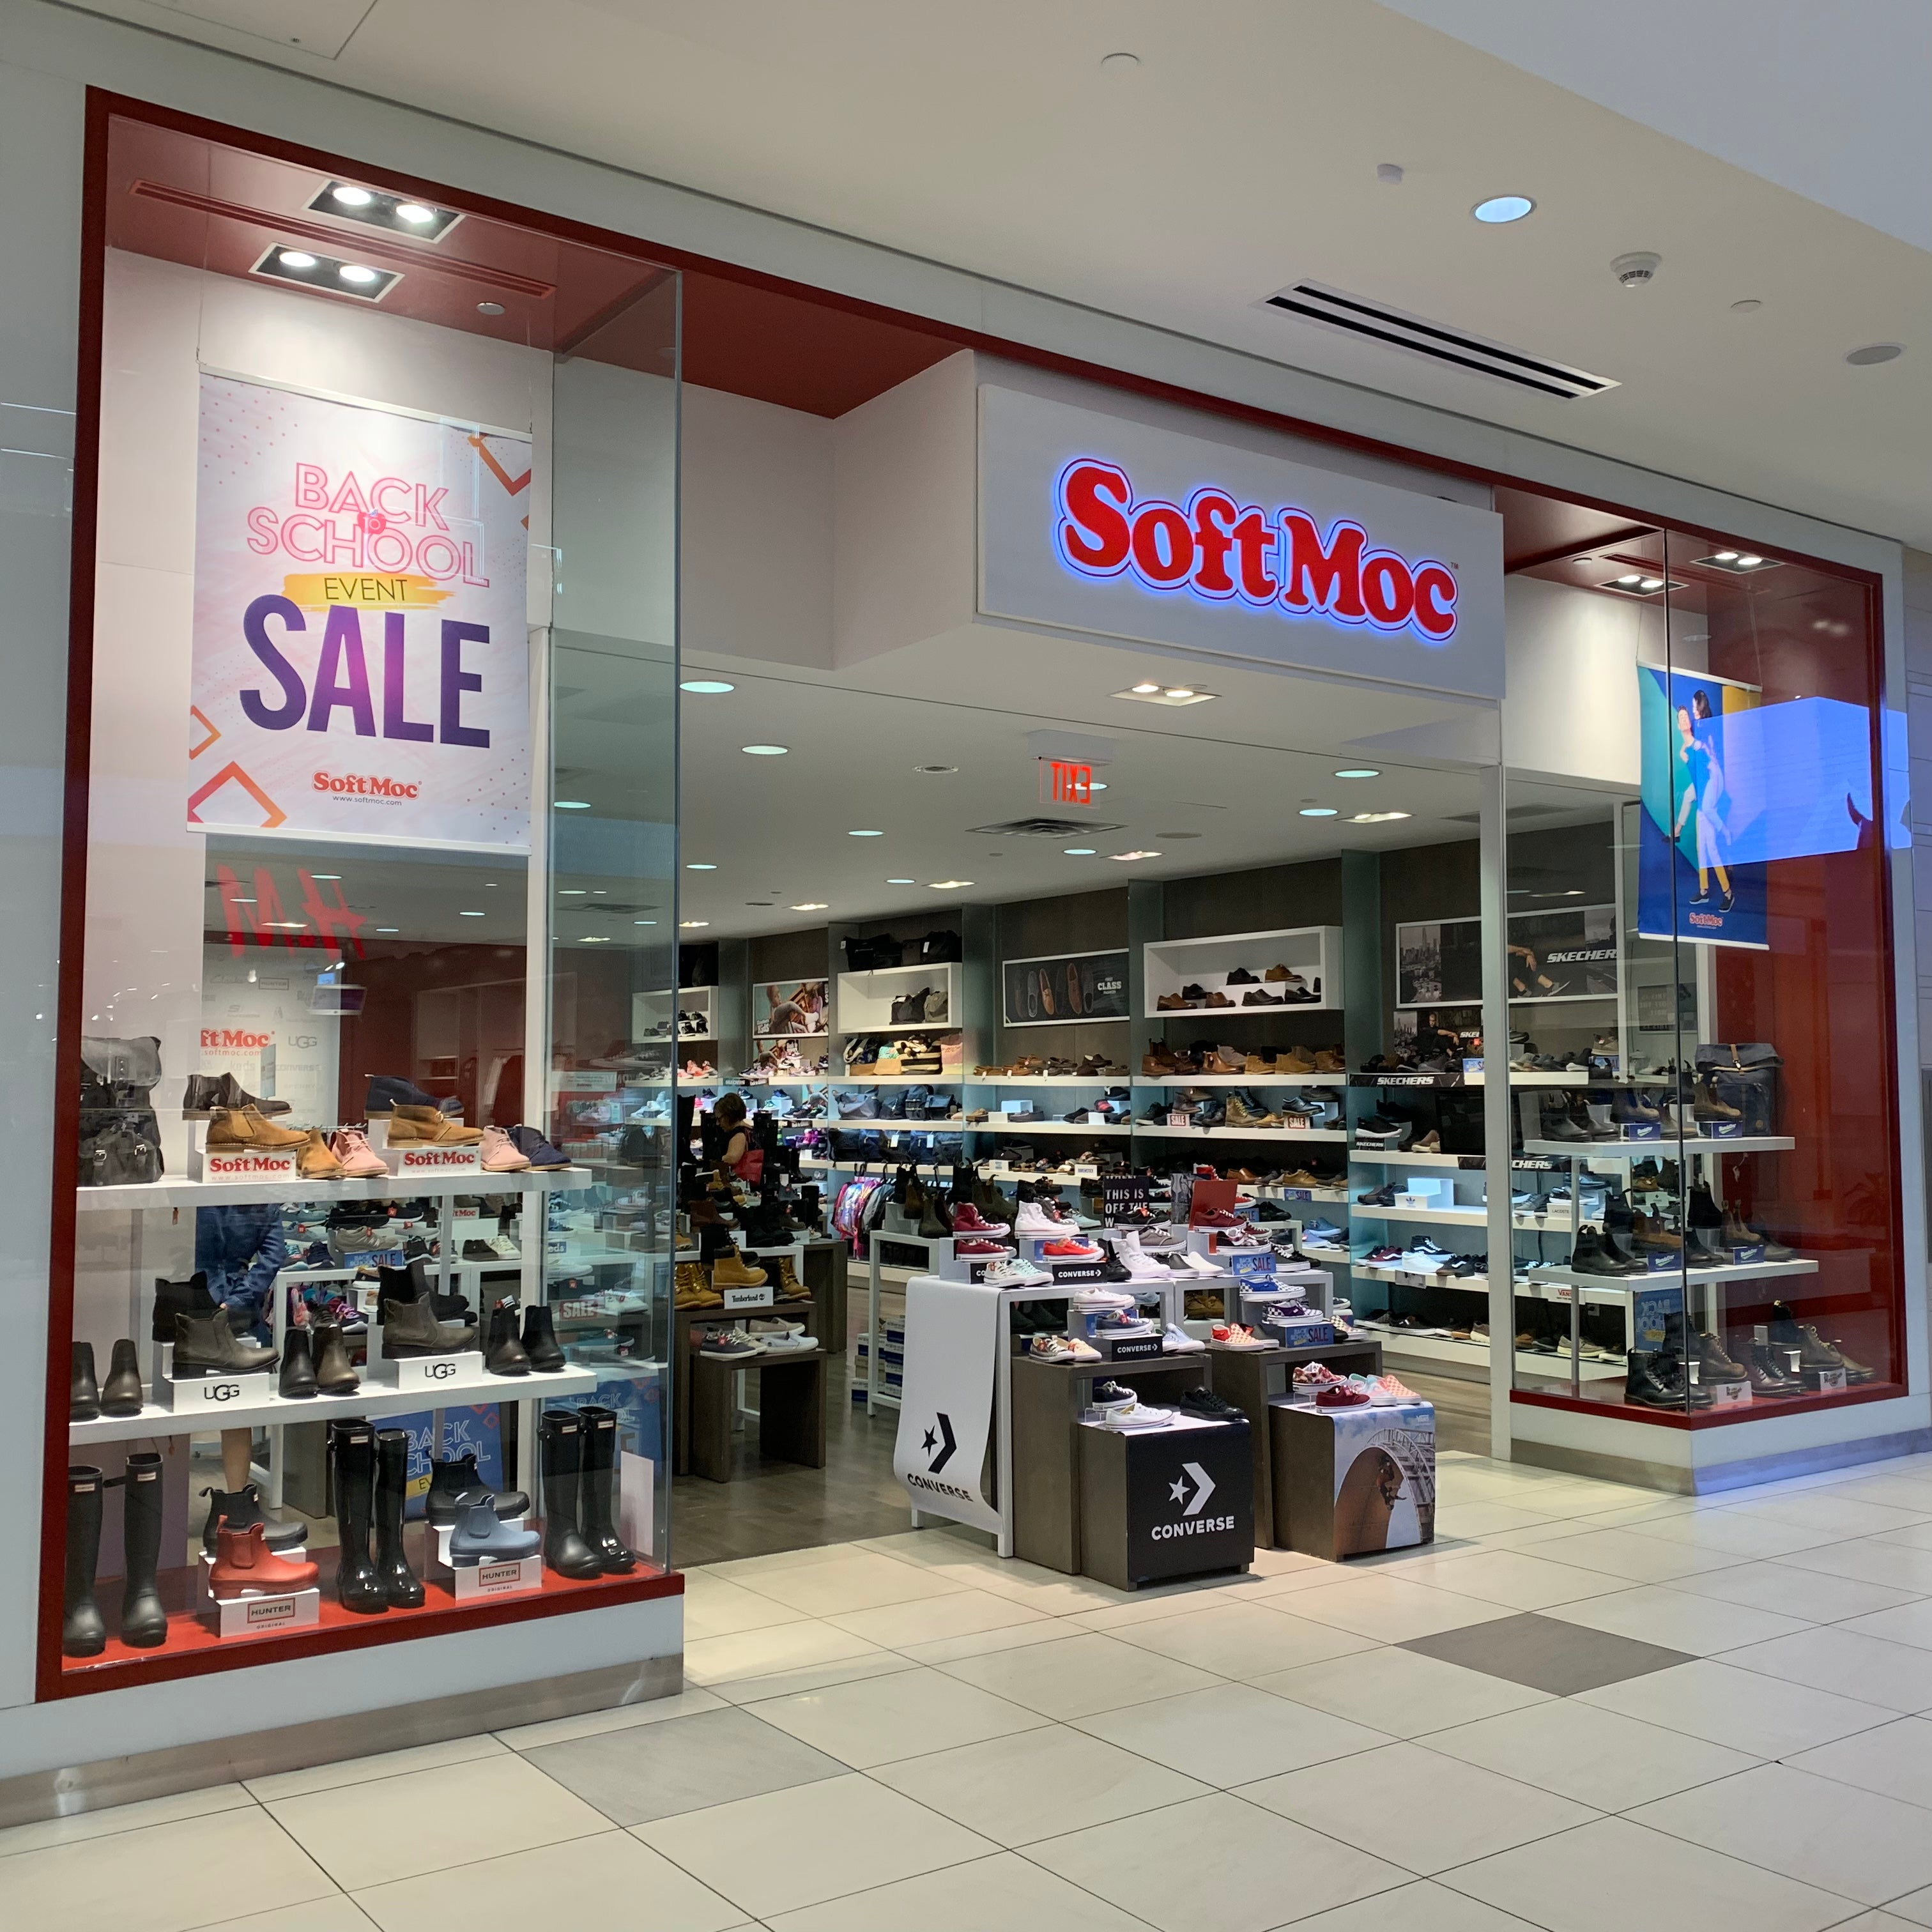 SoftMoc Bayshore Mall